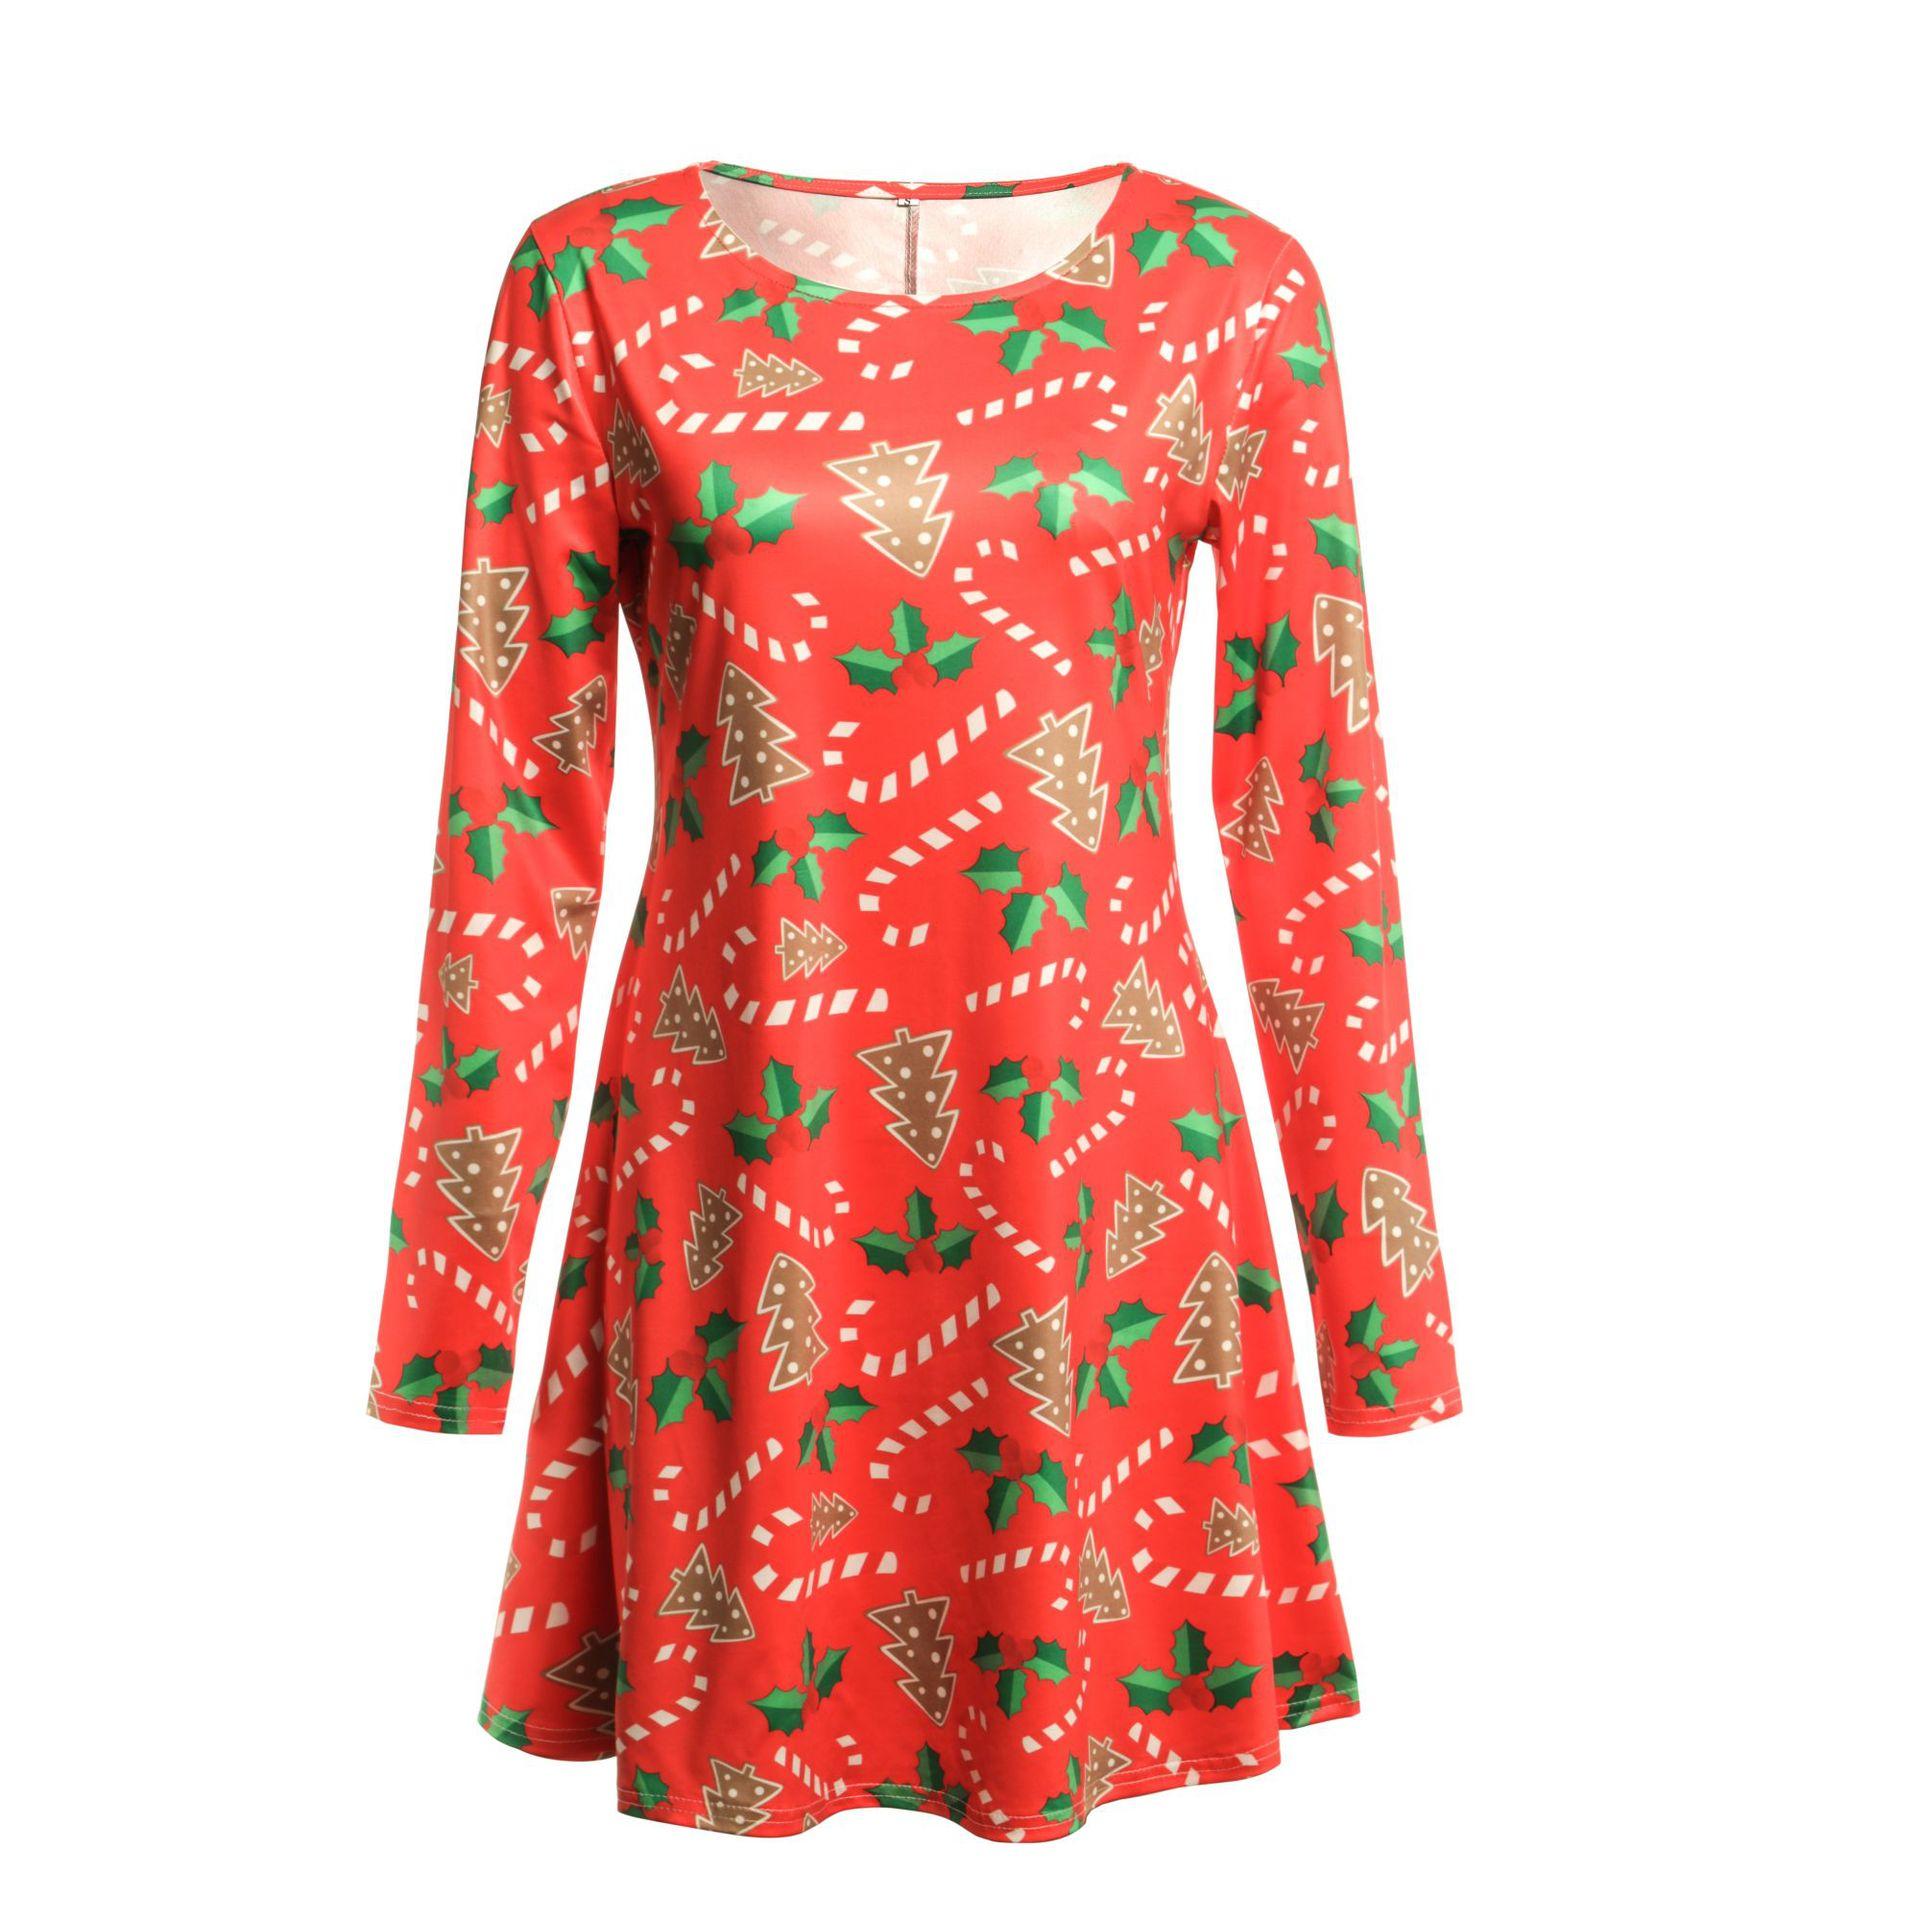 Print Long Sleeve Autumn Winter Christmas Dress Women 19 Casual Loose Short Party Dress Plus Size S-5XL Vestidos 11